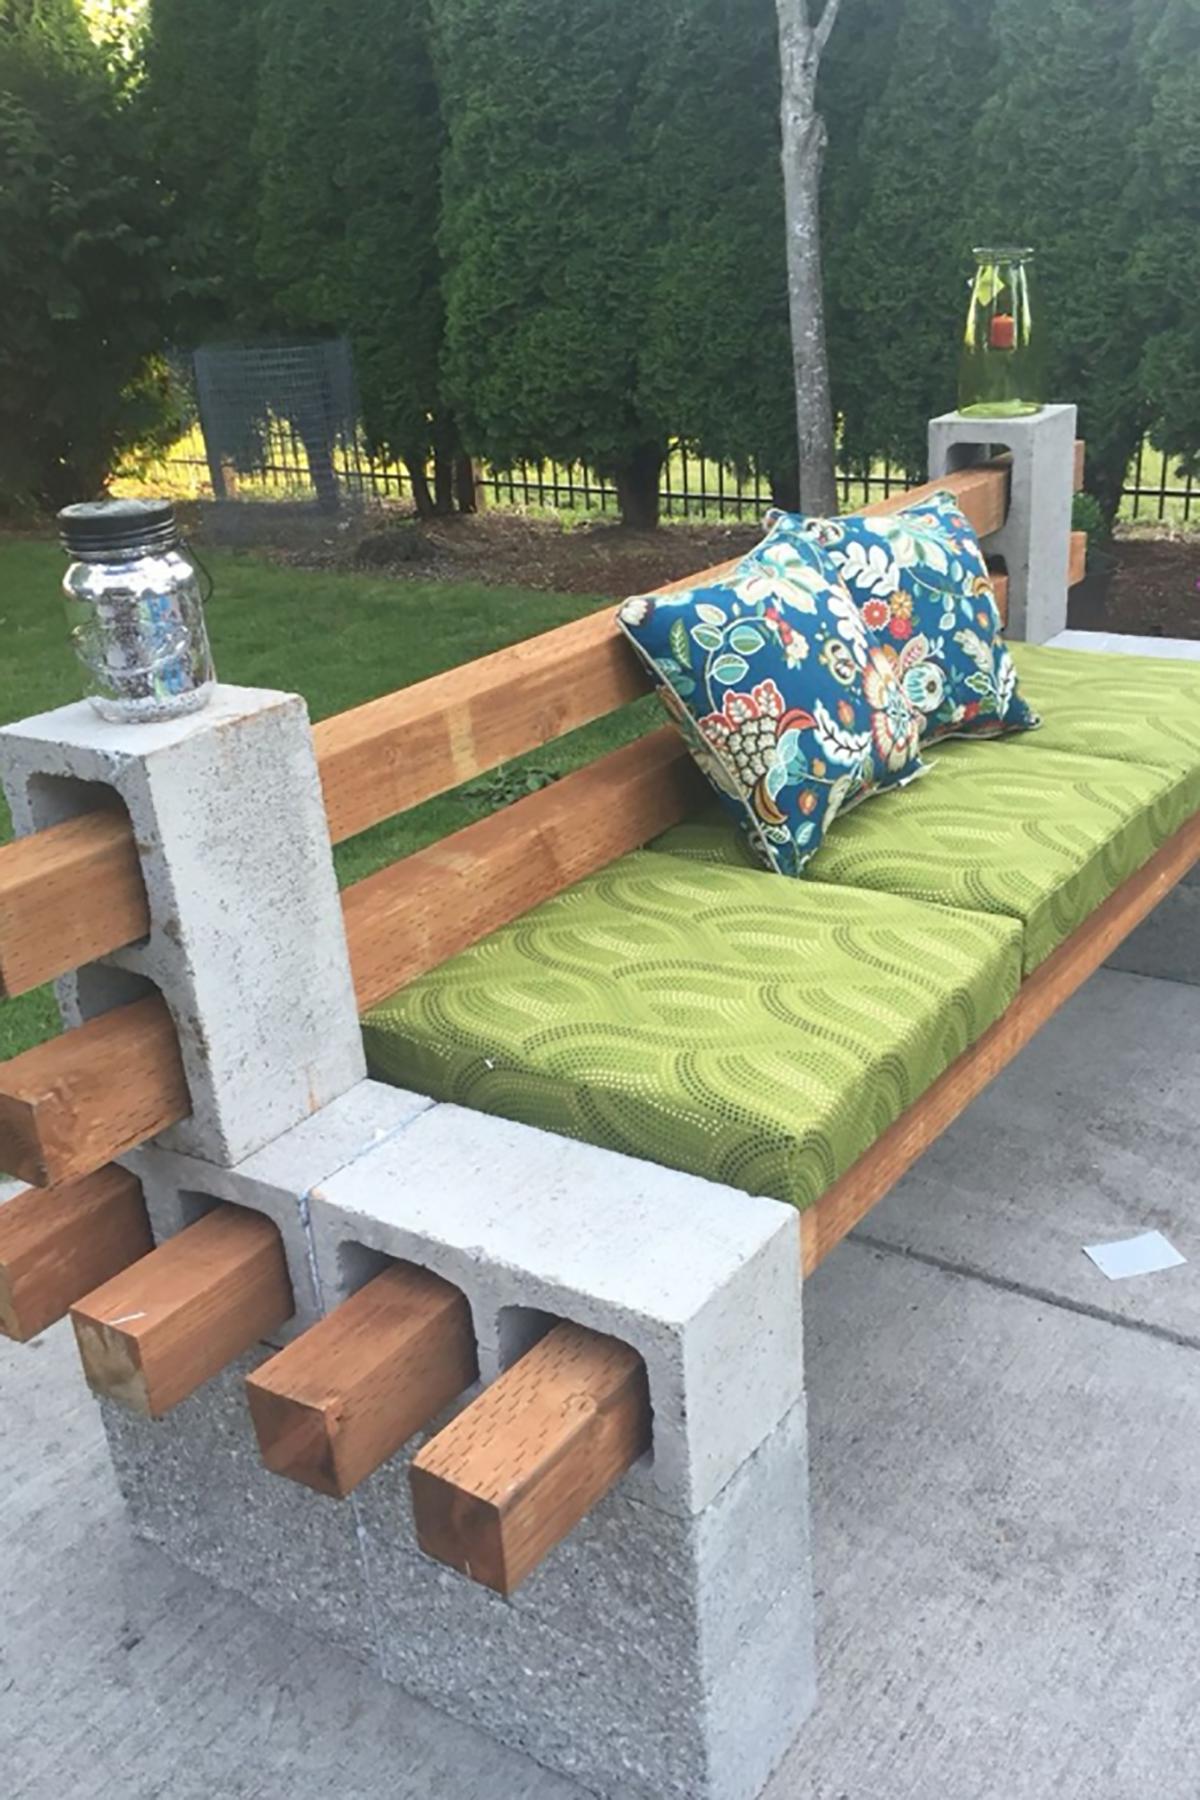 outdoors ptc small gallery llc luxury com amazing stock diy outdoor concept cushions benestuff s seat design bench